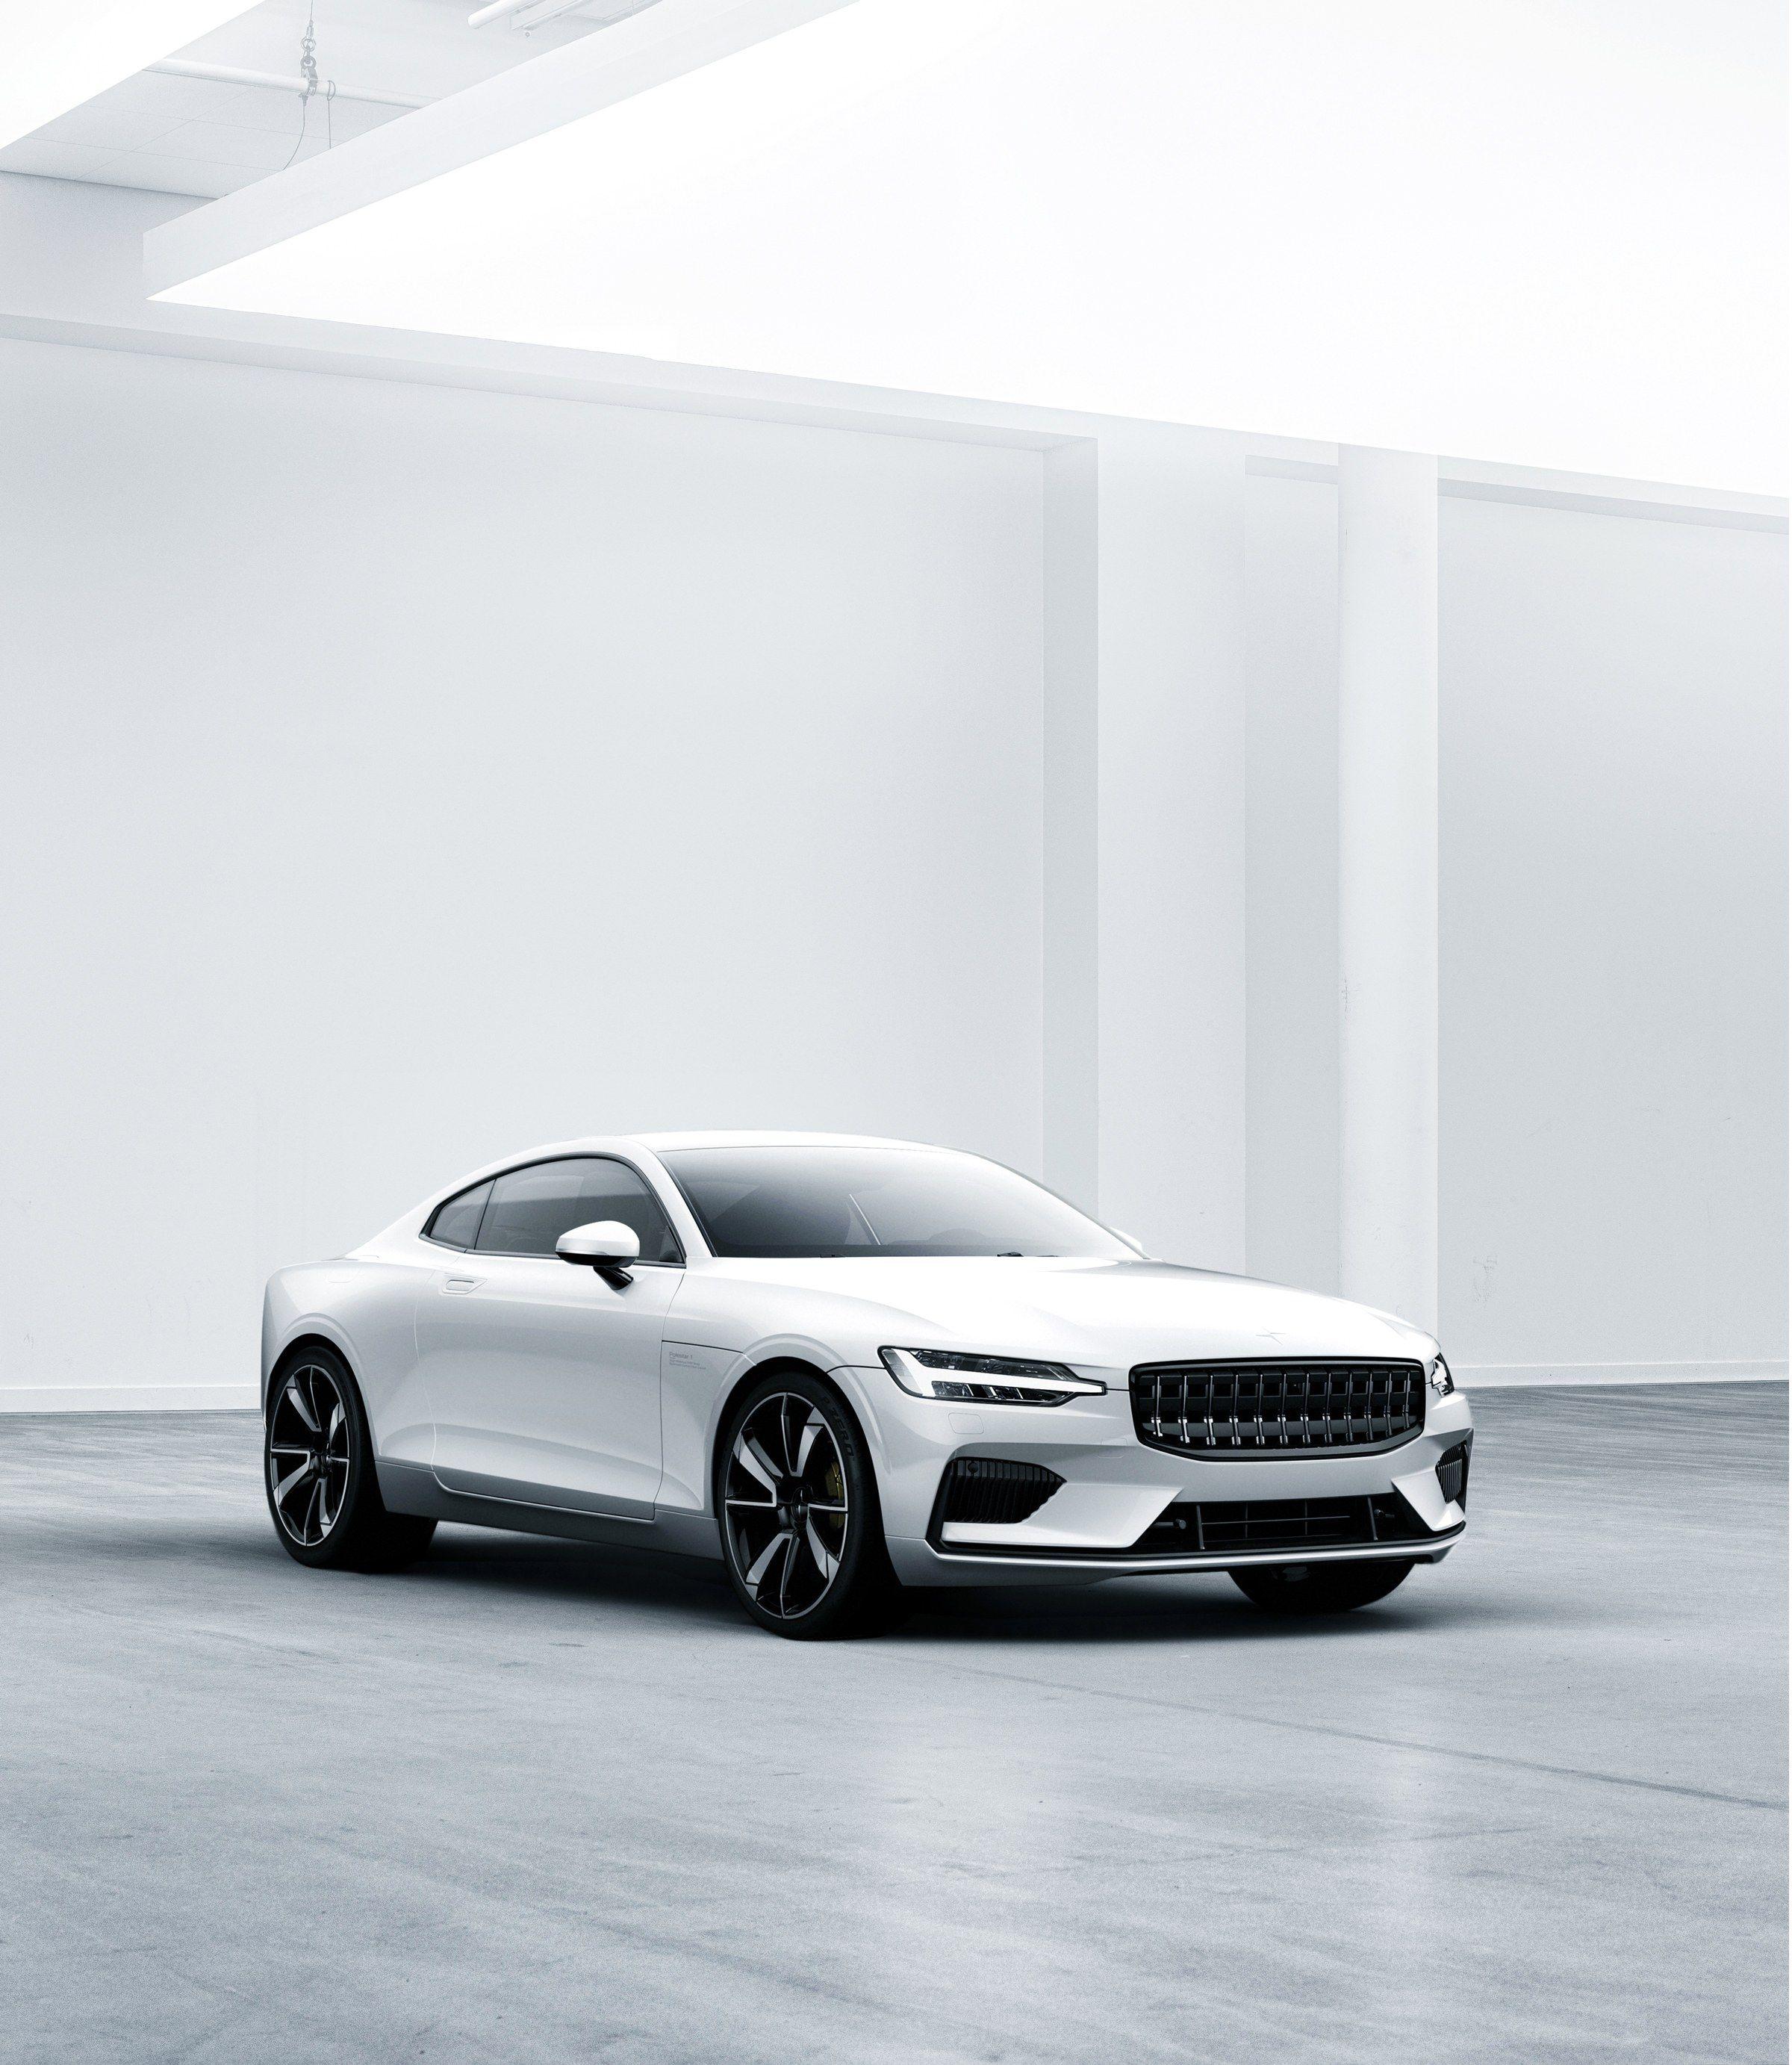 To Take On Tesla, Volvo Revamps Its Polestar Brand